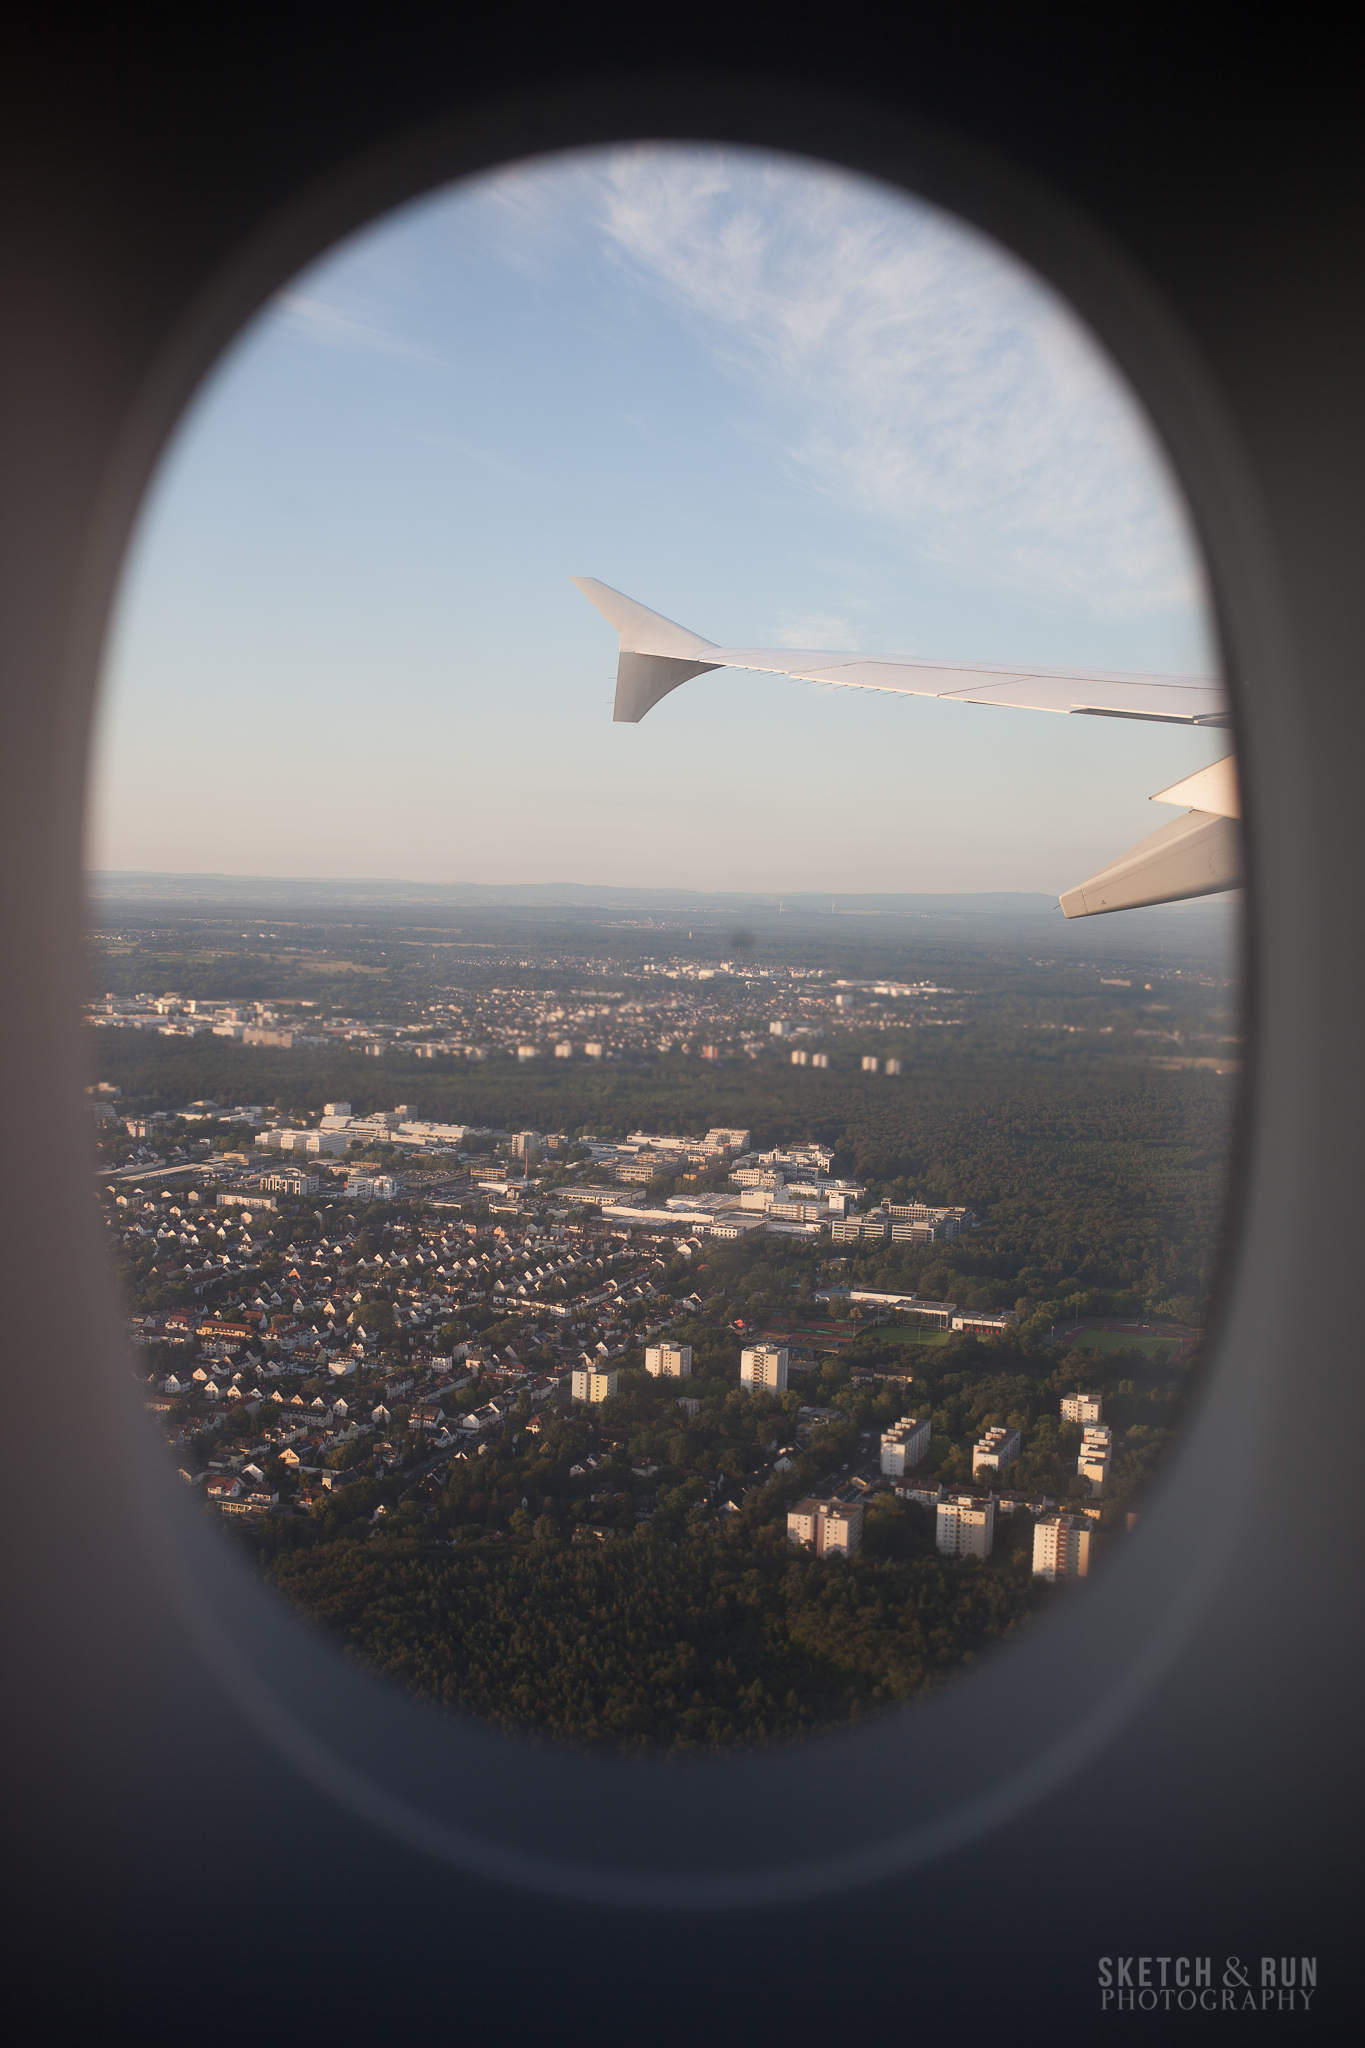 planewindow-8.jpg